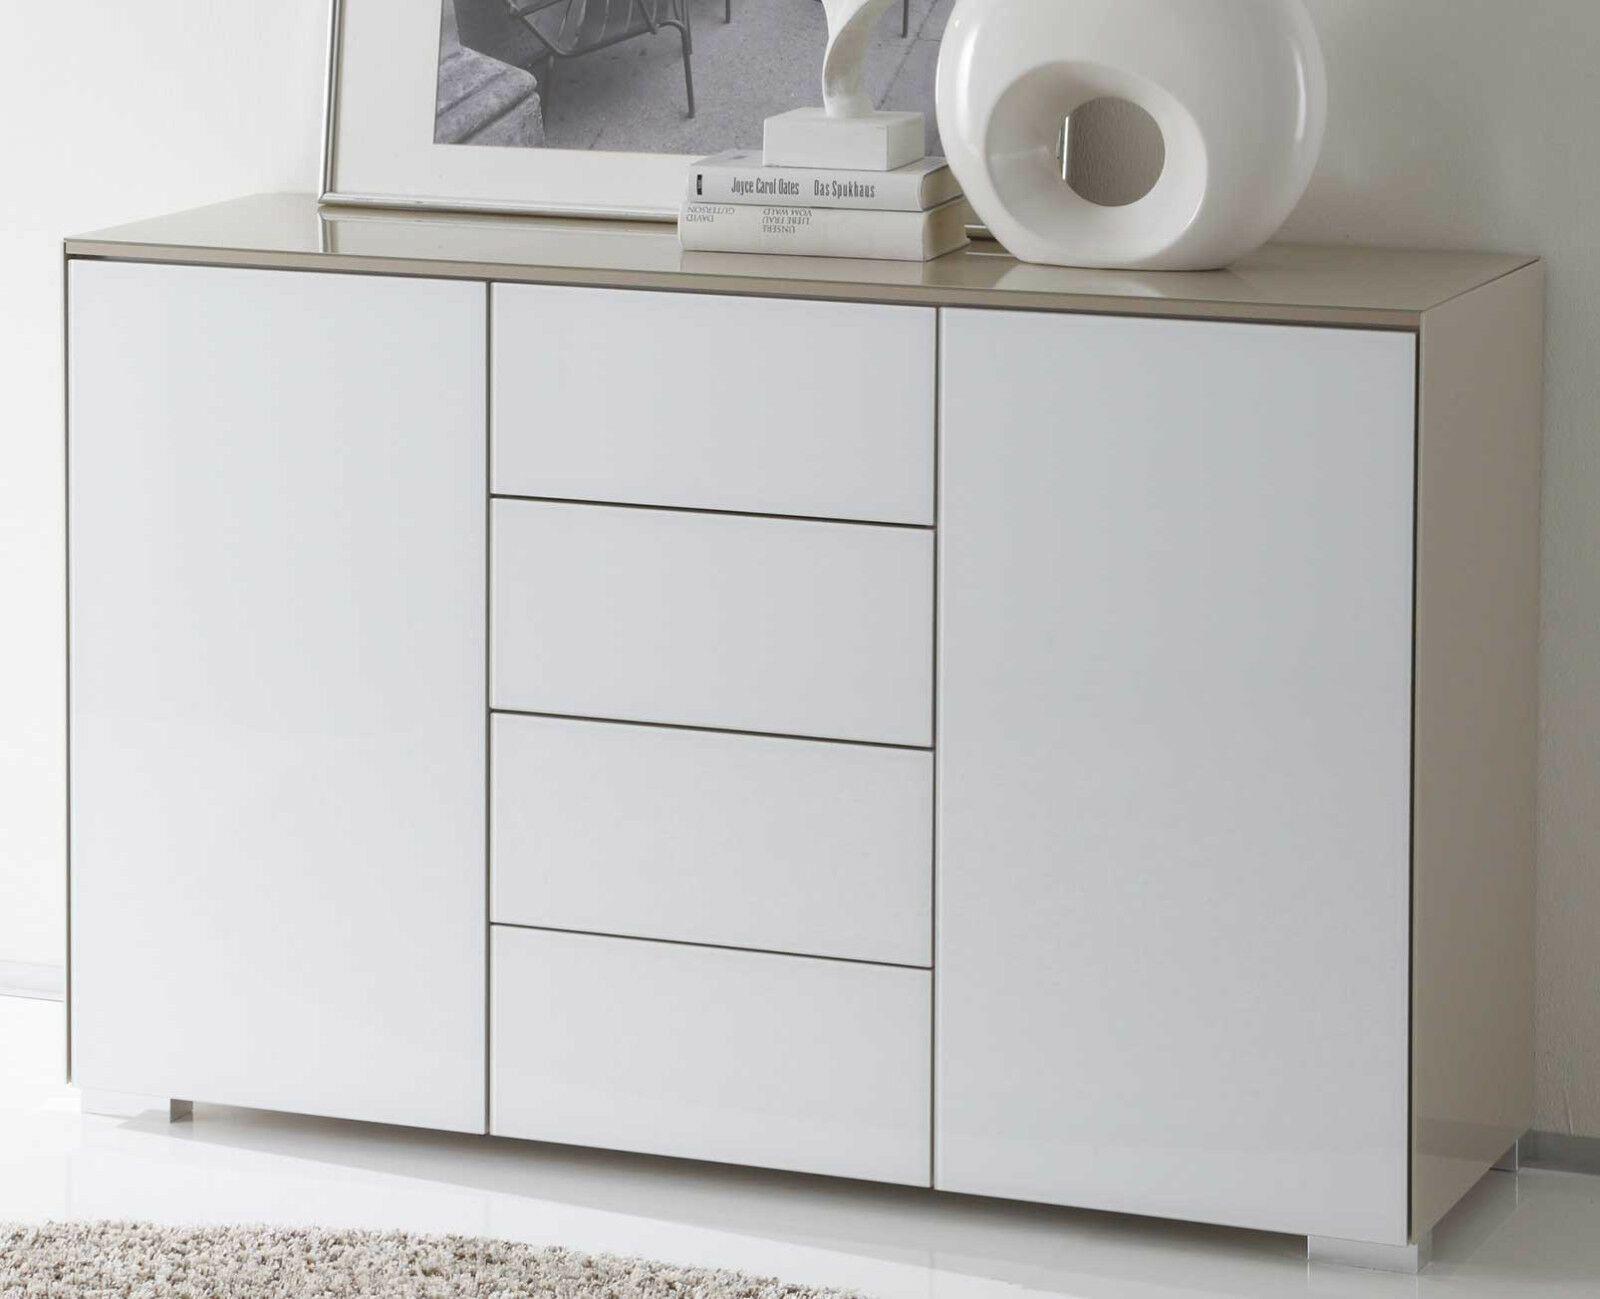 Staud Premium Kommoden Kommode Mit Schubladen Kombikommode Vollverglast V Farbe In 2020 Kommode Kommoden Schubladen Schubladen